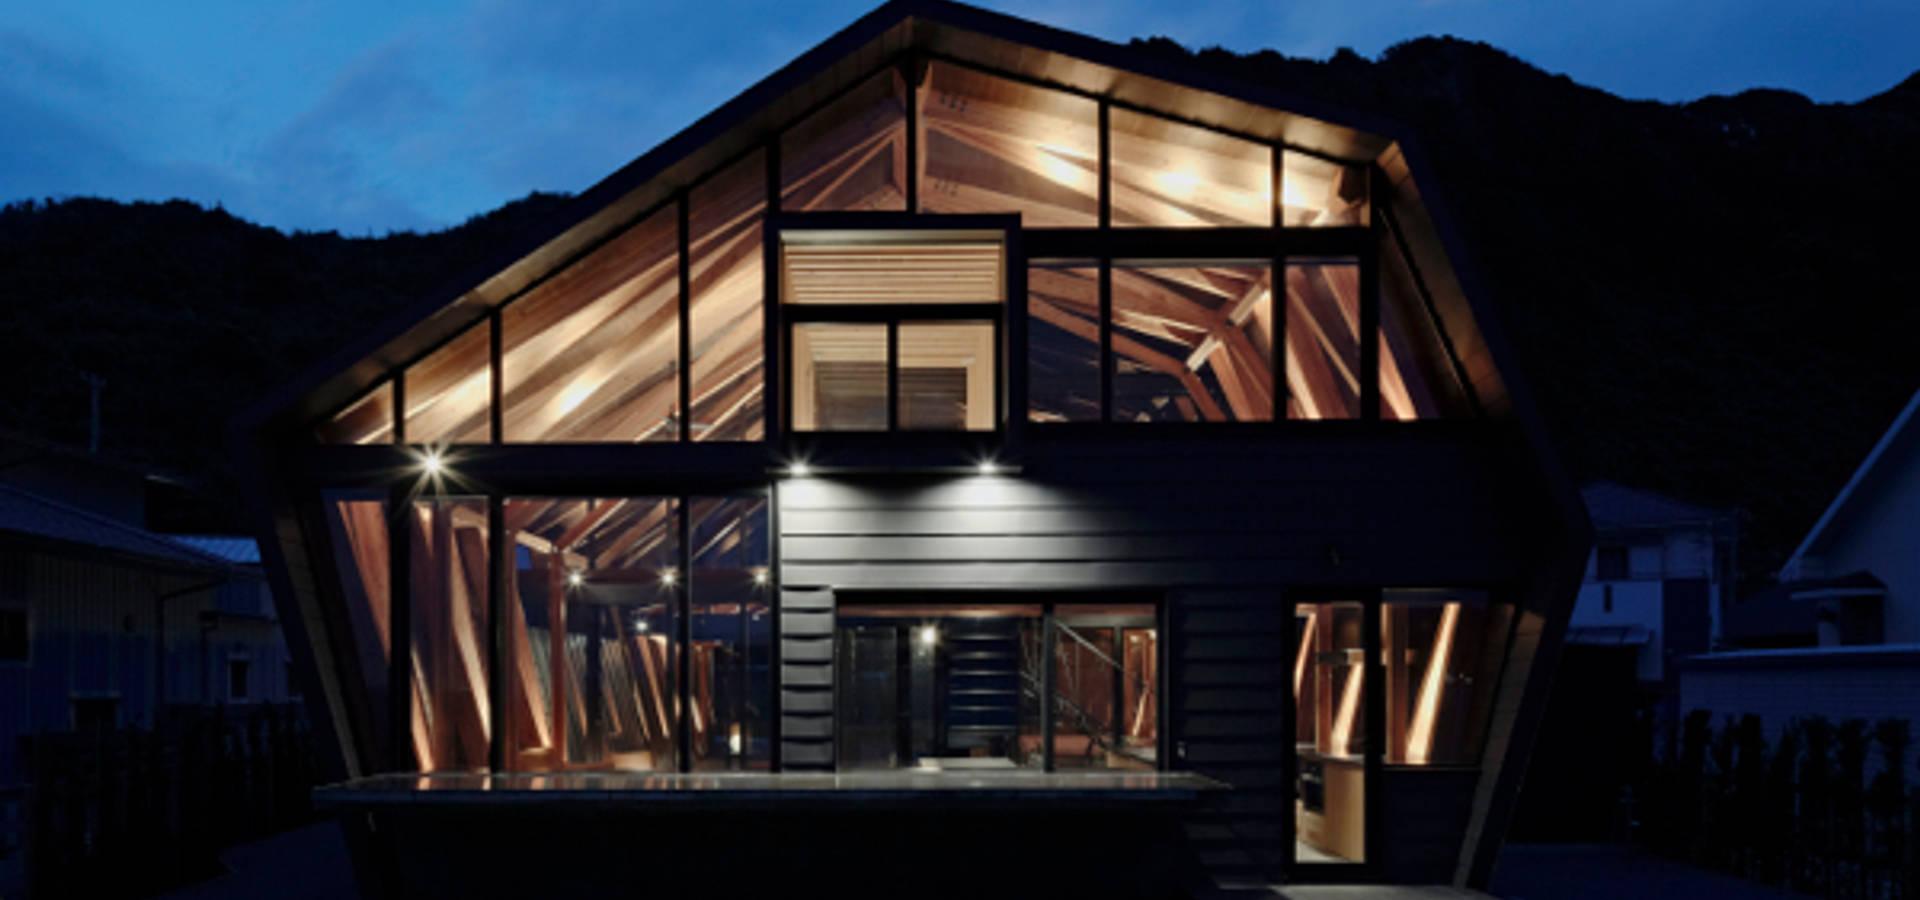 Takeshi Hirobe Architects /株式会社 廣部剛司建築研究所